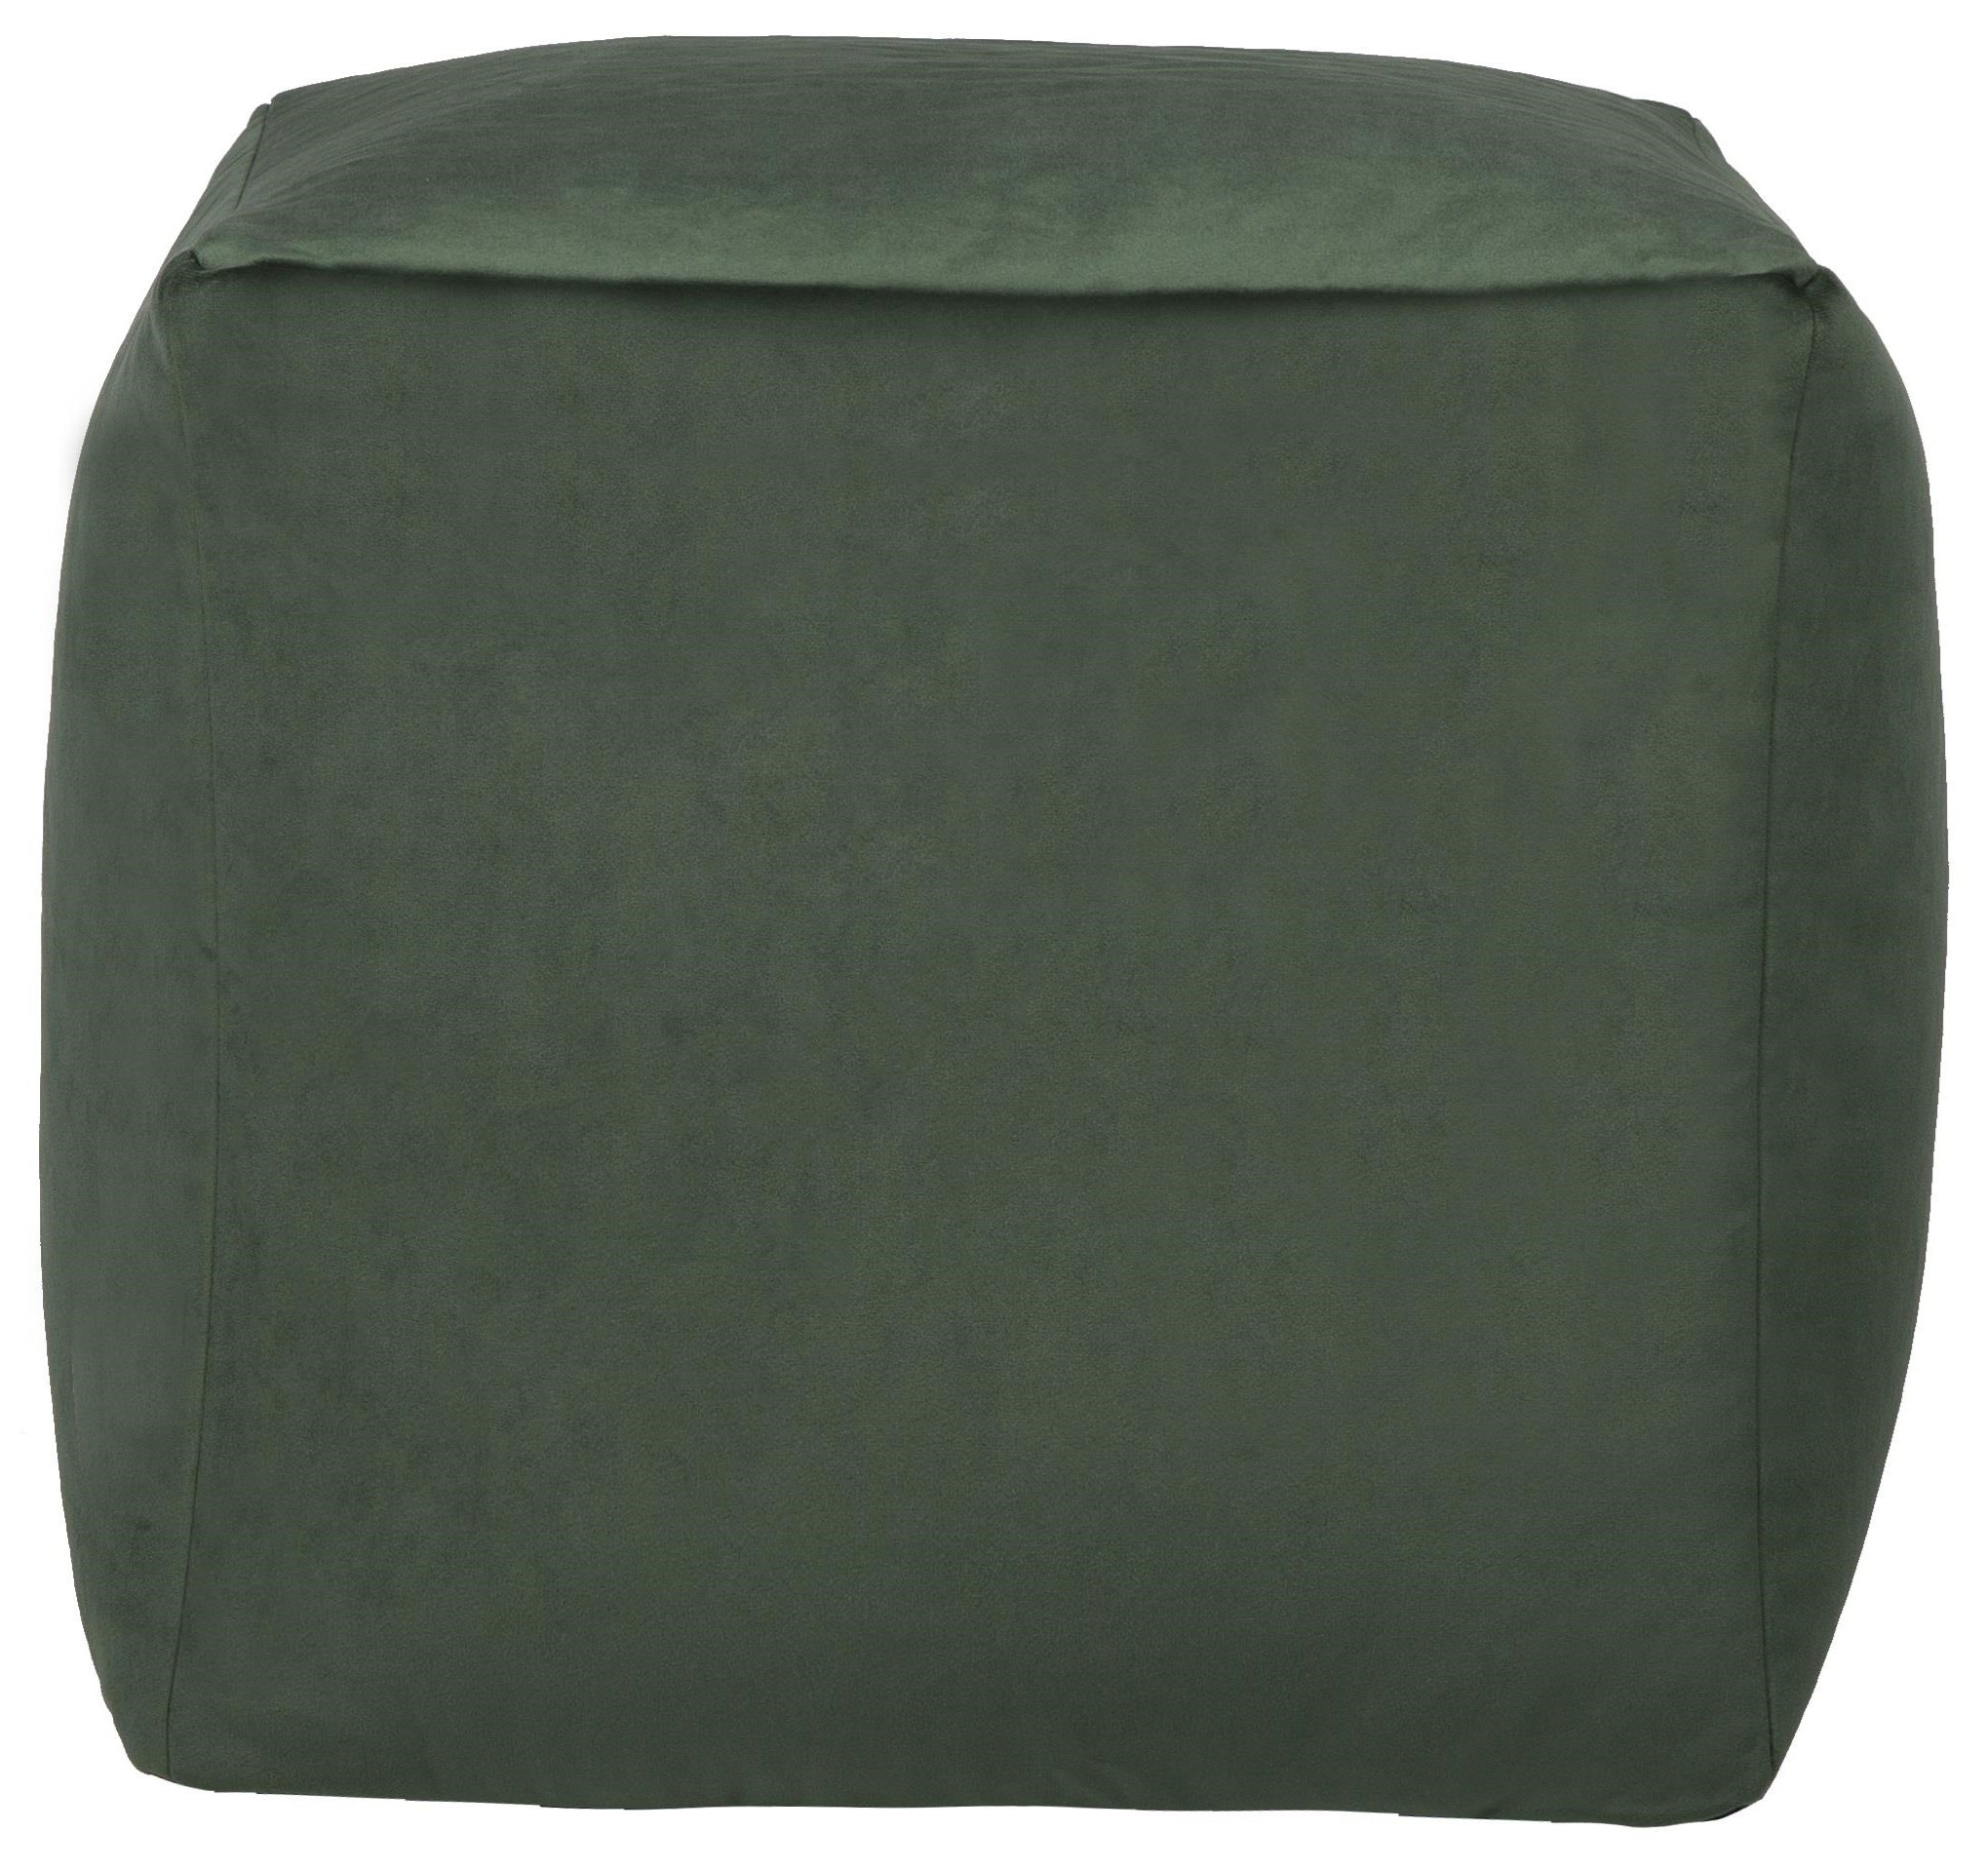 Beanbag Green Cube Beanbag by Lazy Life Paris at HomeWorld Furniture